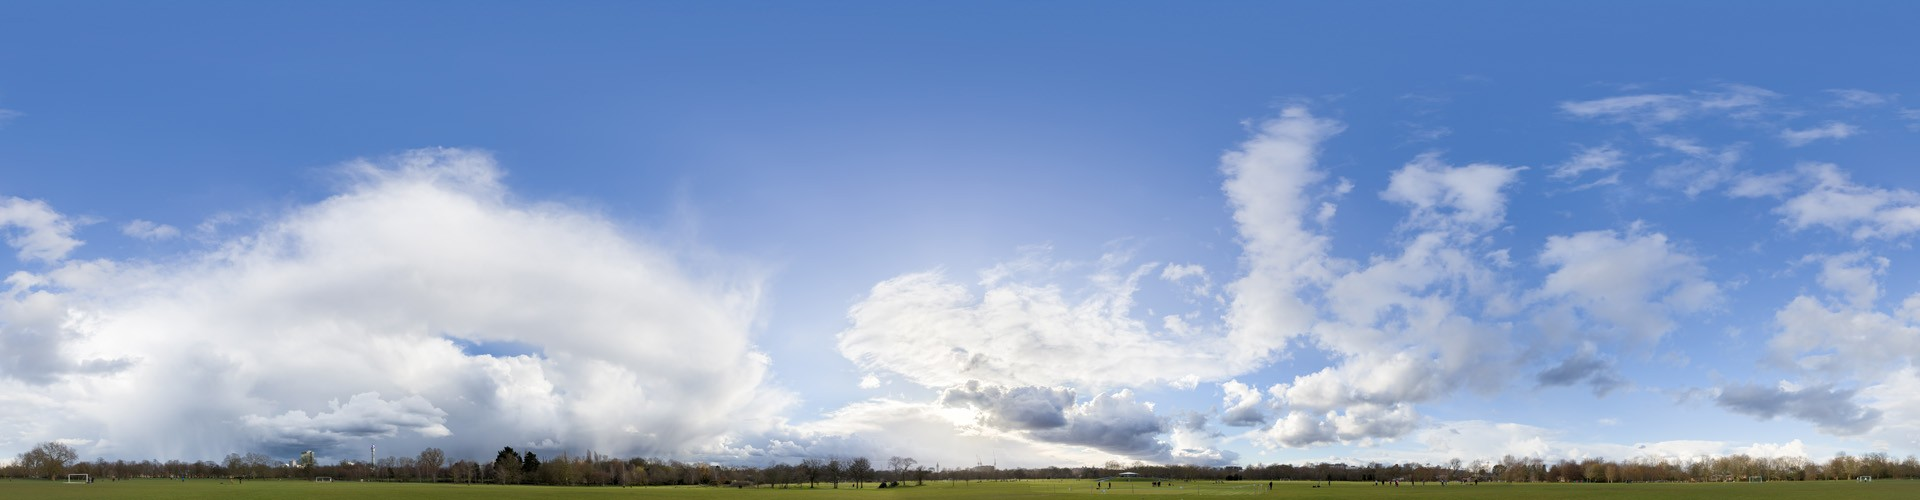 Rainy Clouds 2705 (30k) HDRI